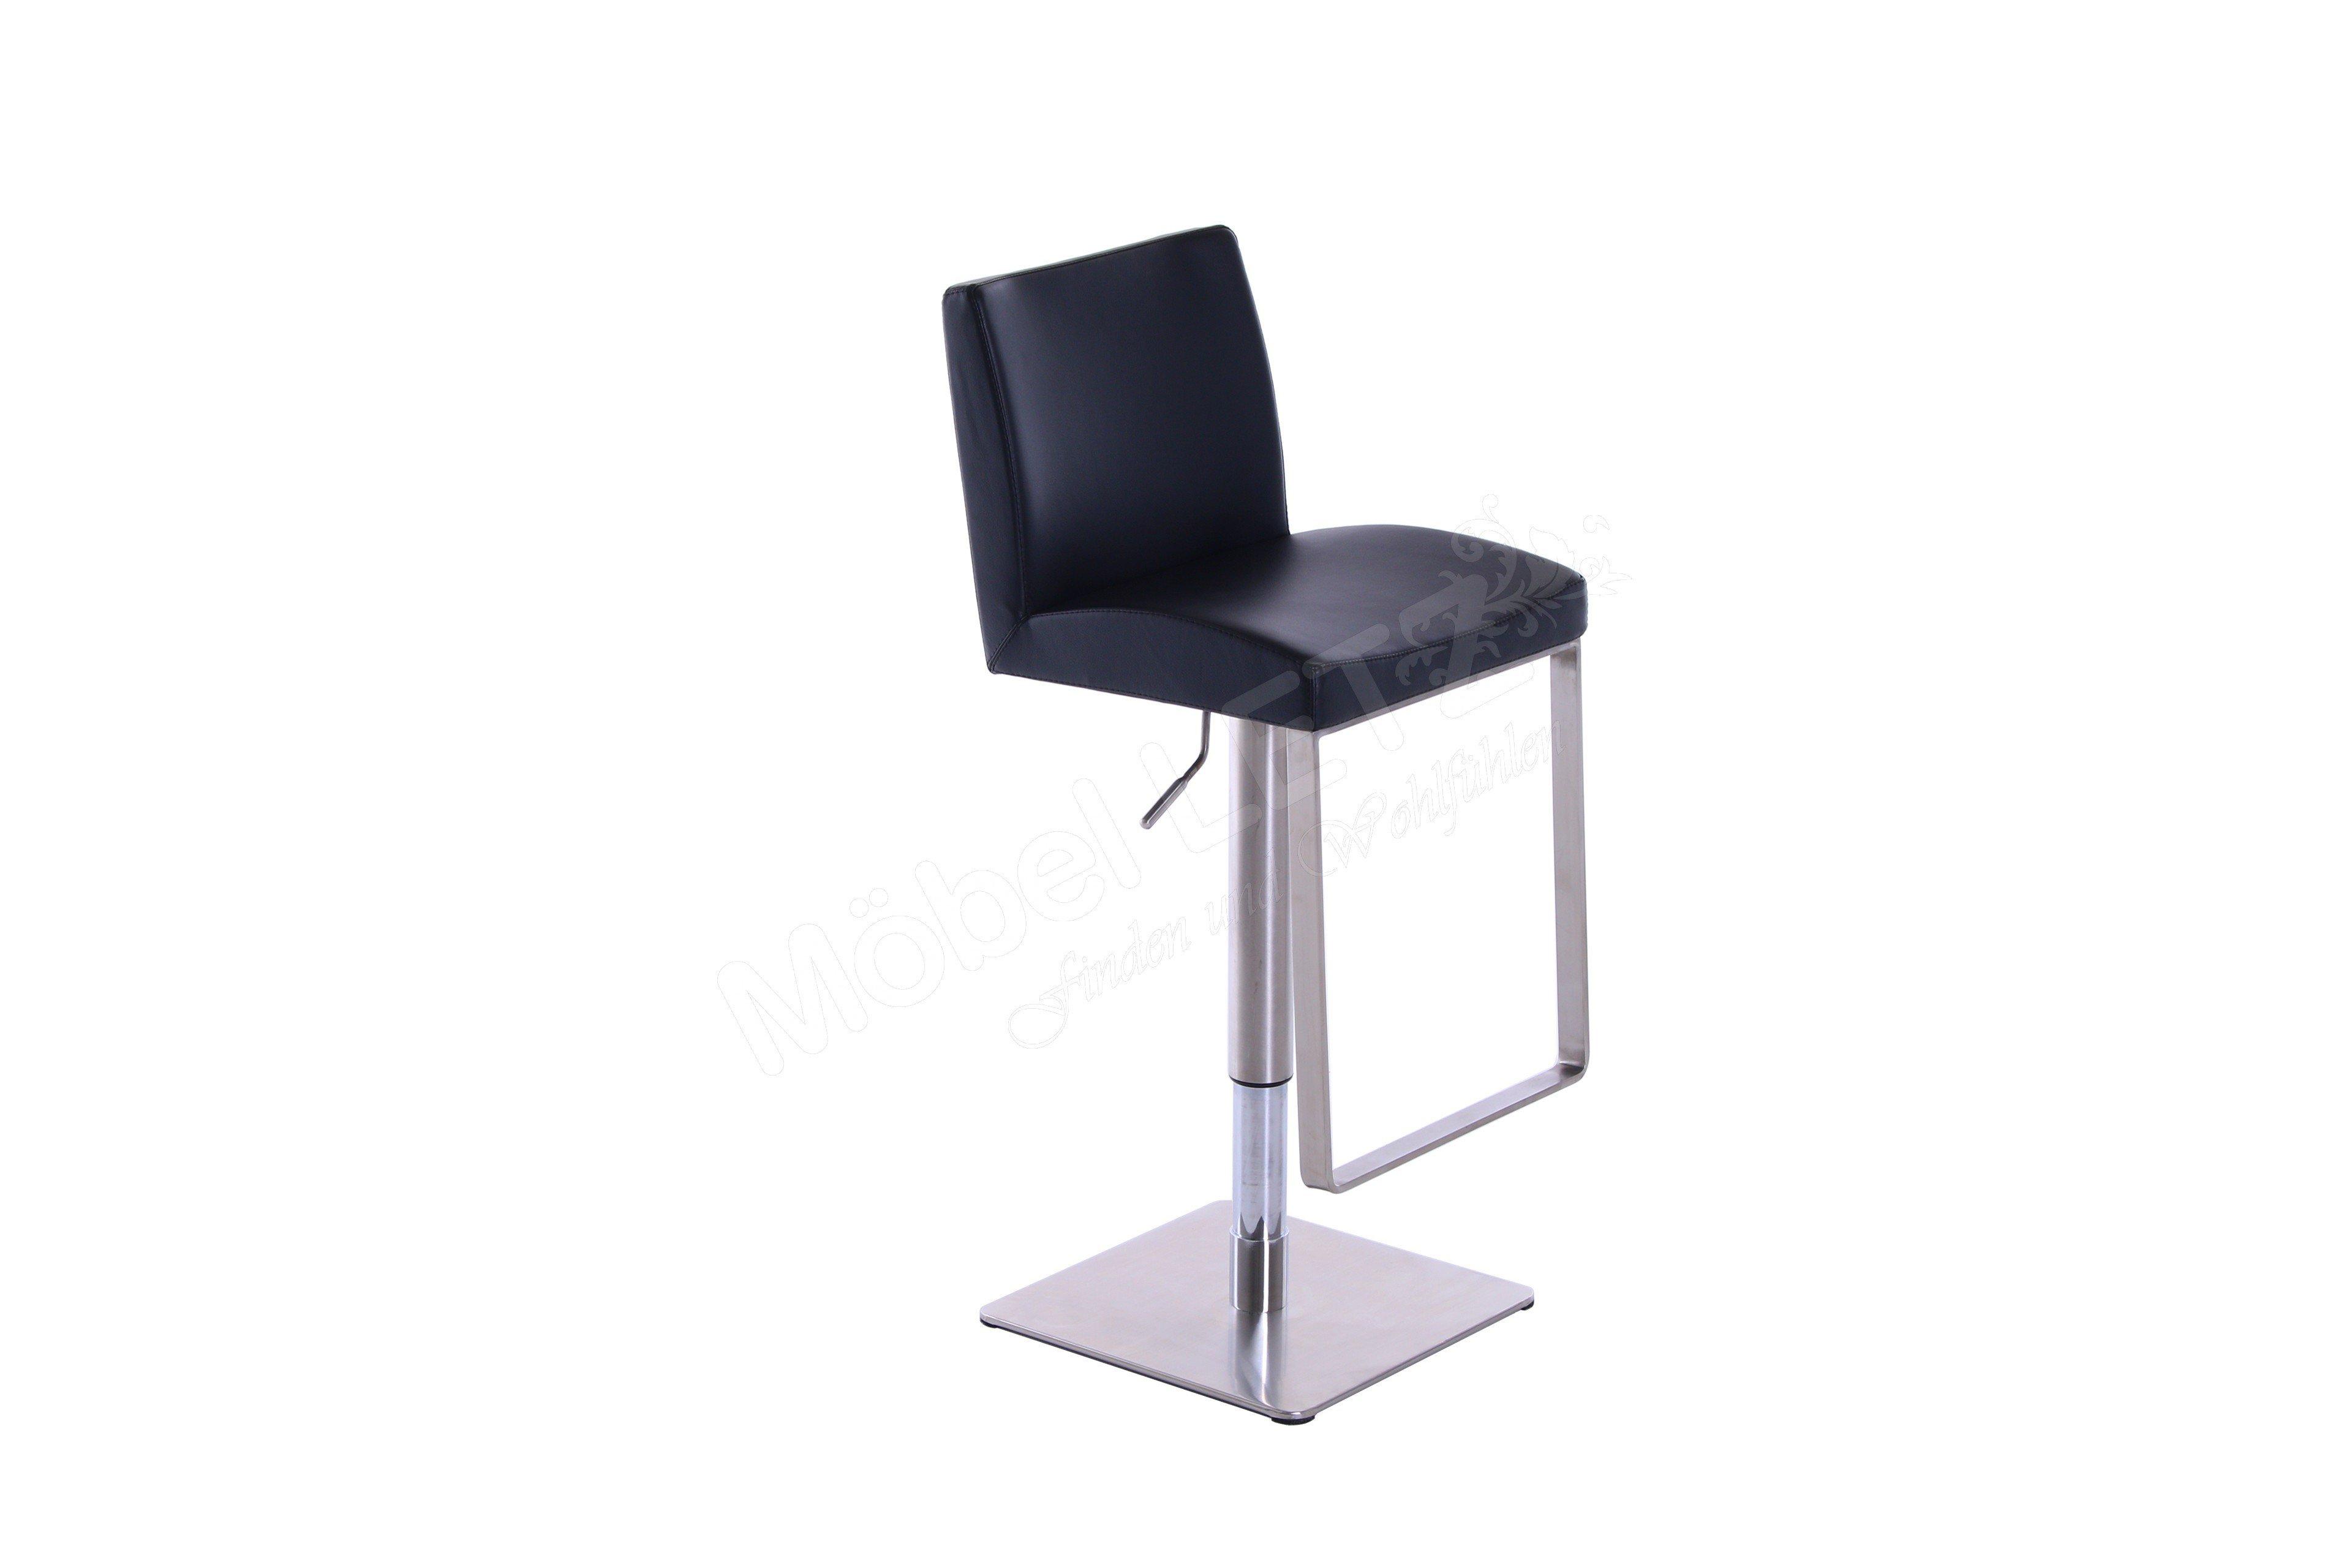 barstuhl mybreak 1260e von mayer sitzm bel m bel letz ihr online shop. Black Bedroom Furniture Sets. Home Design Ideas